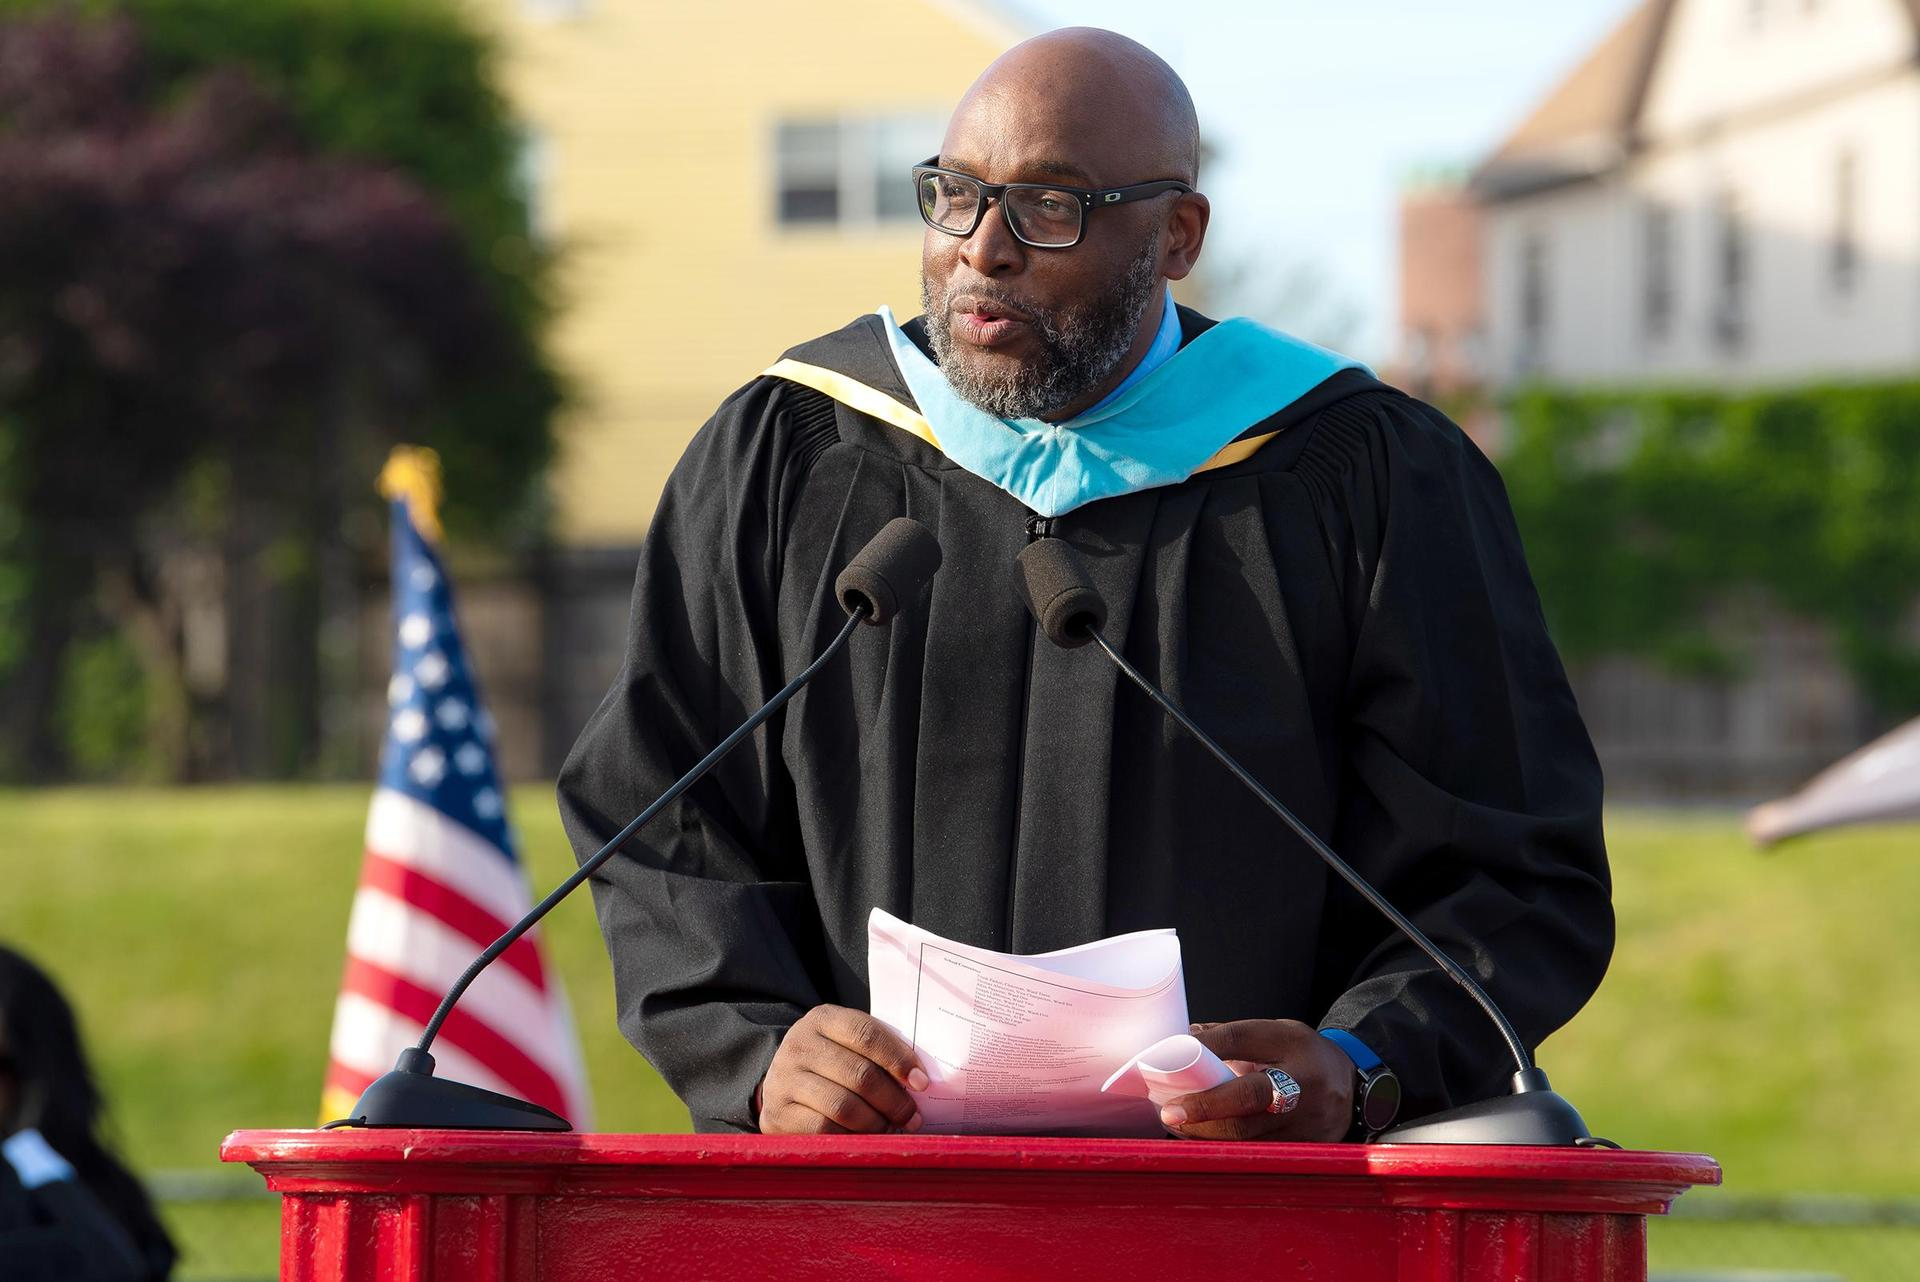 Vice Principal Cory McCarthy addresses the Class of 2021